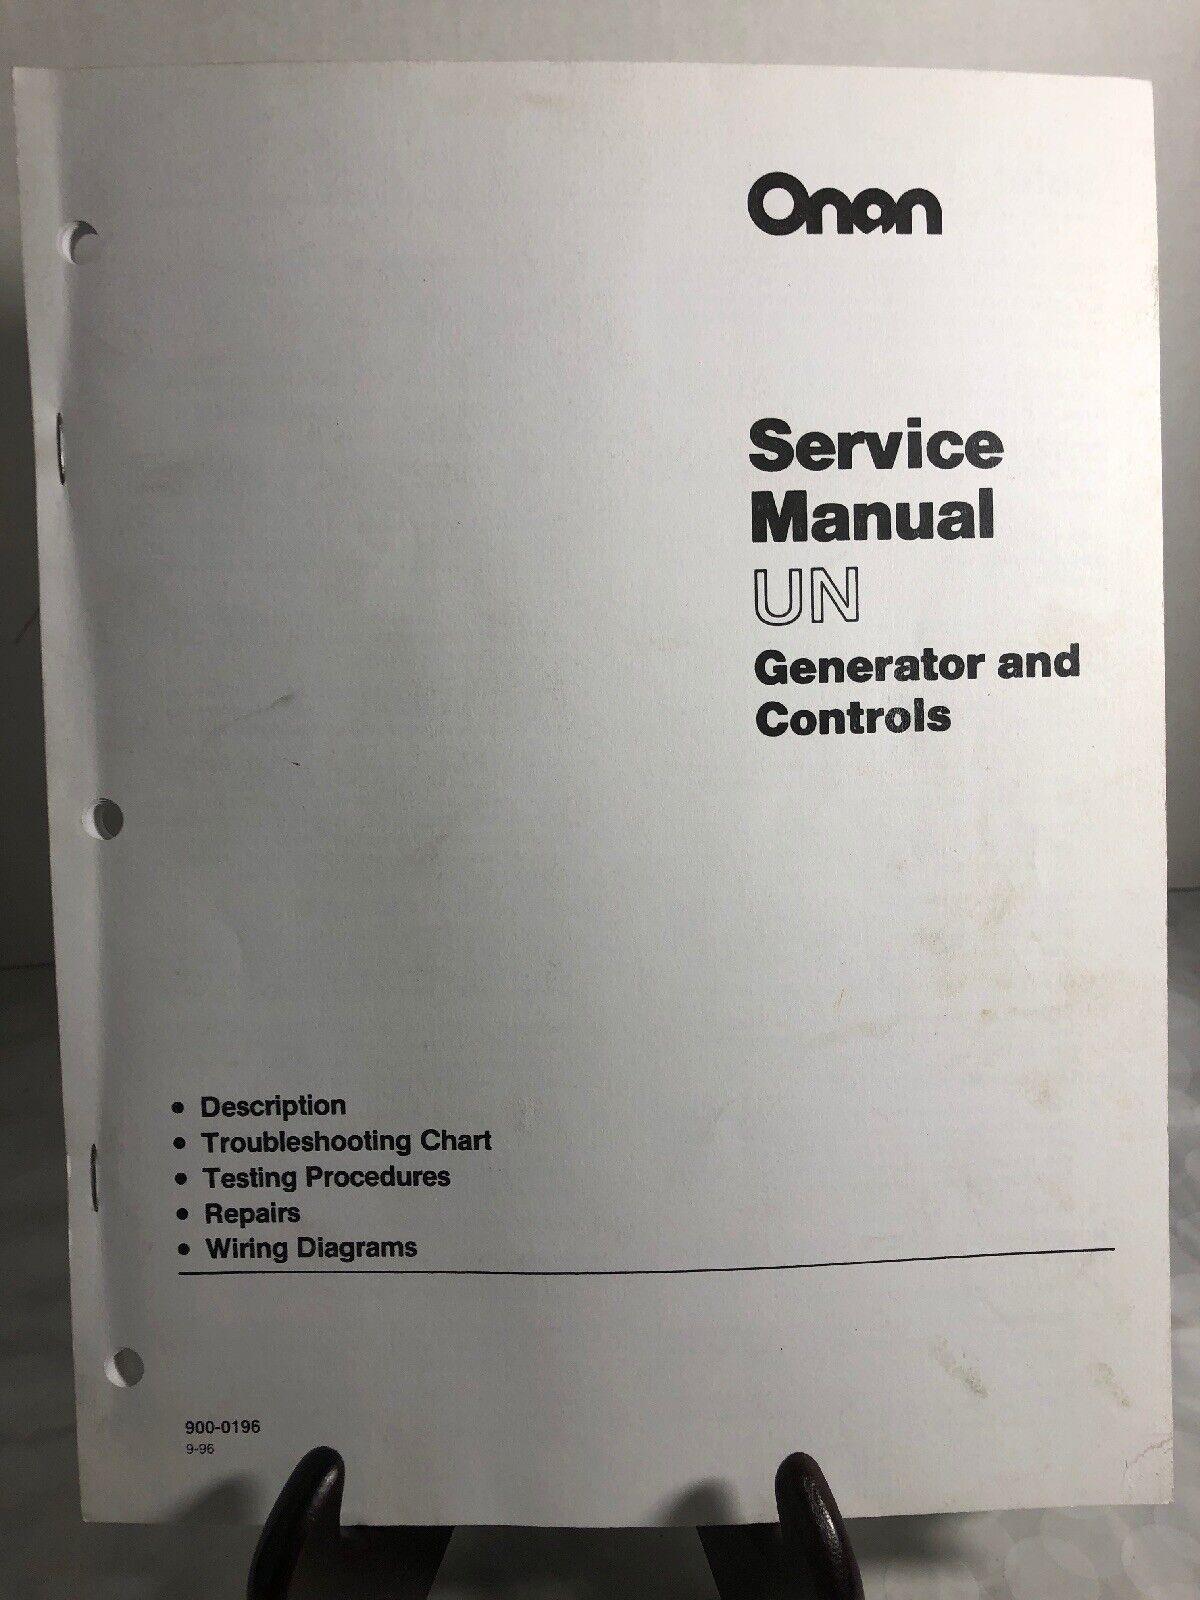 Onan Un Generator and Controls Service Manual BF NH CCK Onan Cck Wiring Diagram on generator wiring diagram, onan cck oil filter, onan generator engine diagram, onan engine parts diagram, onan cck exhaust, onan cck flywheel, onan cck parts, onan cck engine, onan generator parts diagrams, onan cck coil, onan cck generator, onan cck service manual, onan 5000 wiring-diagram, onan generator carburetor diagram,